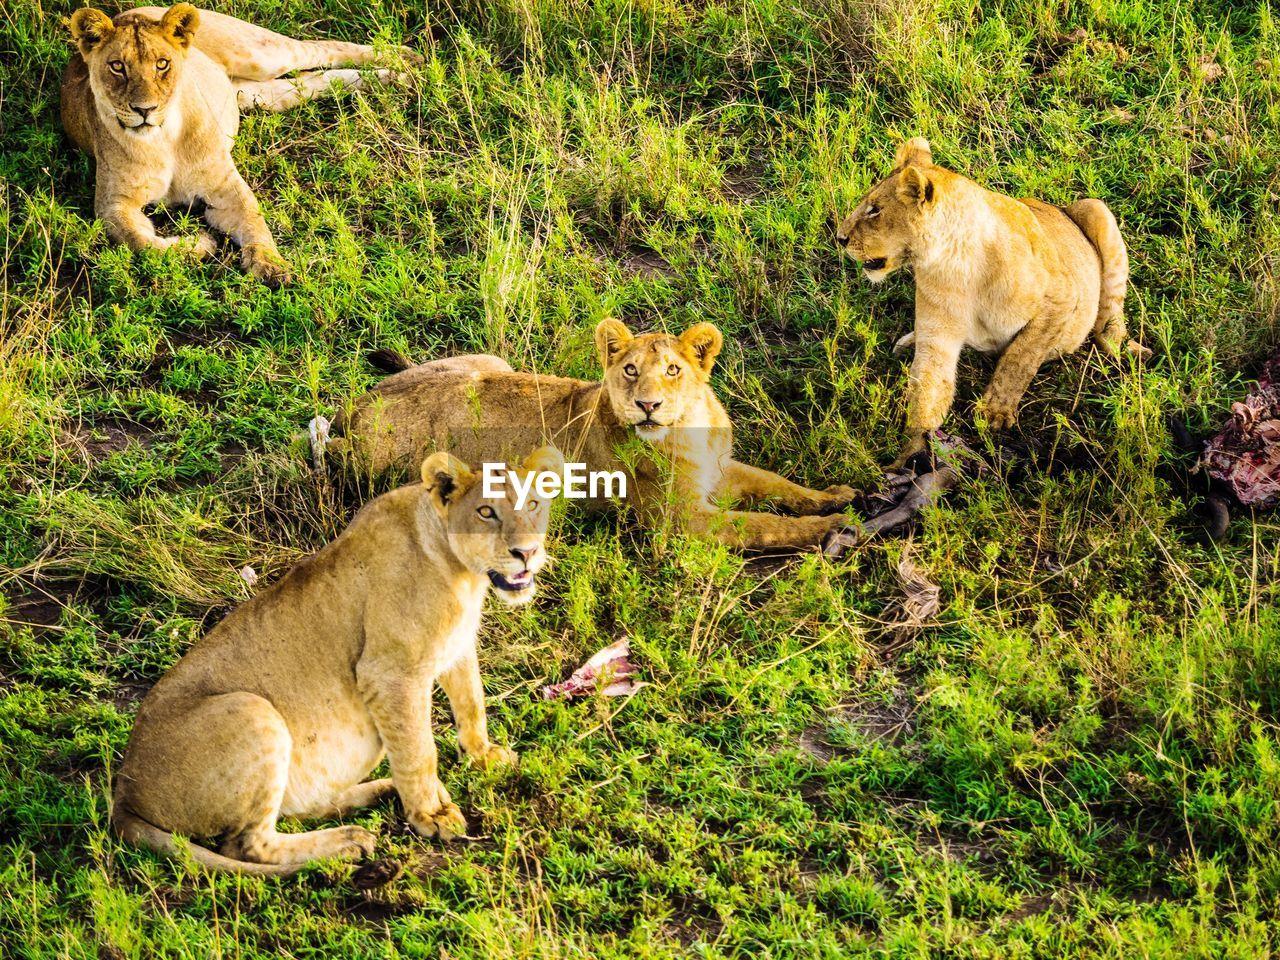 group of animals, mammal, animal, animal themes, lion - feline, animal wildlife, feline, cat, animals in the wild, lioness, lion cub, plant, female animal, grass, young animal, cub, two animals, vertebrate, nature, animal family, no people, outdoors, undomesticated cat